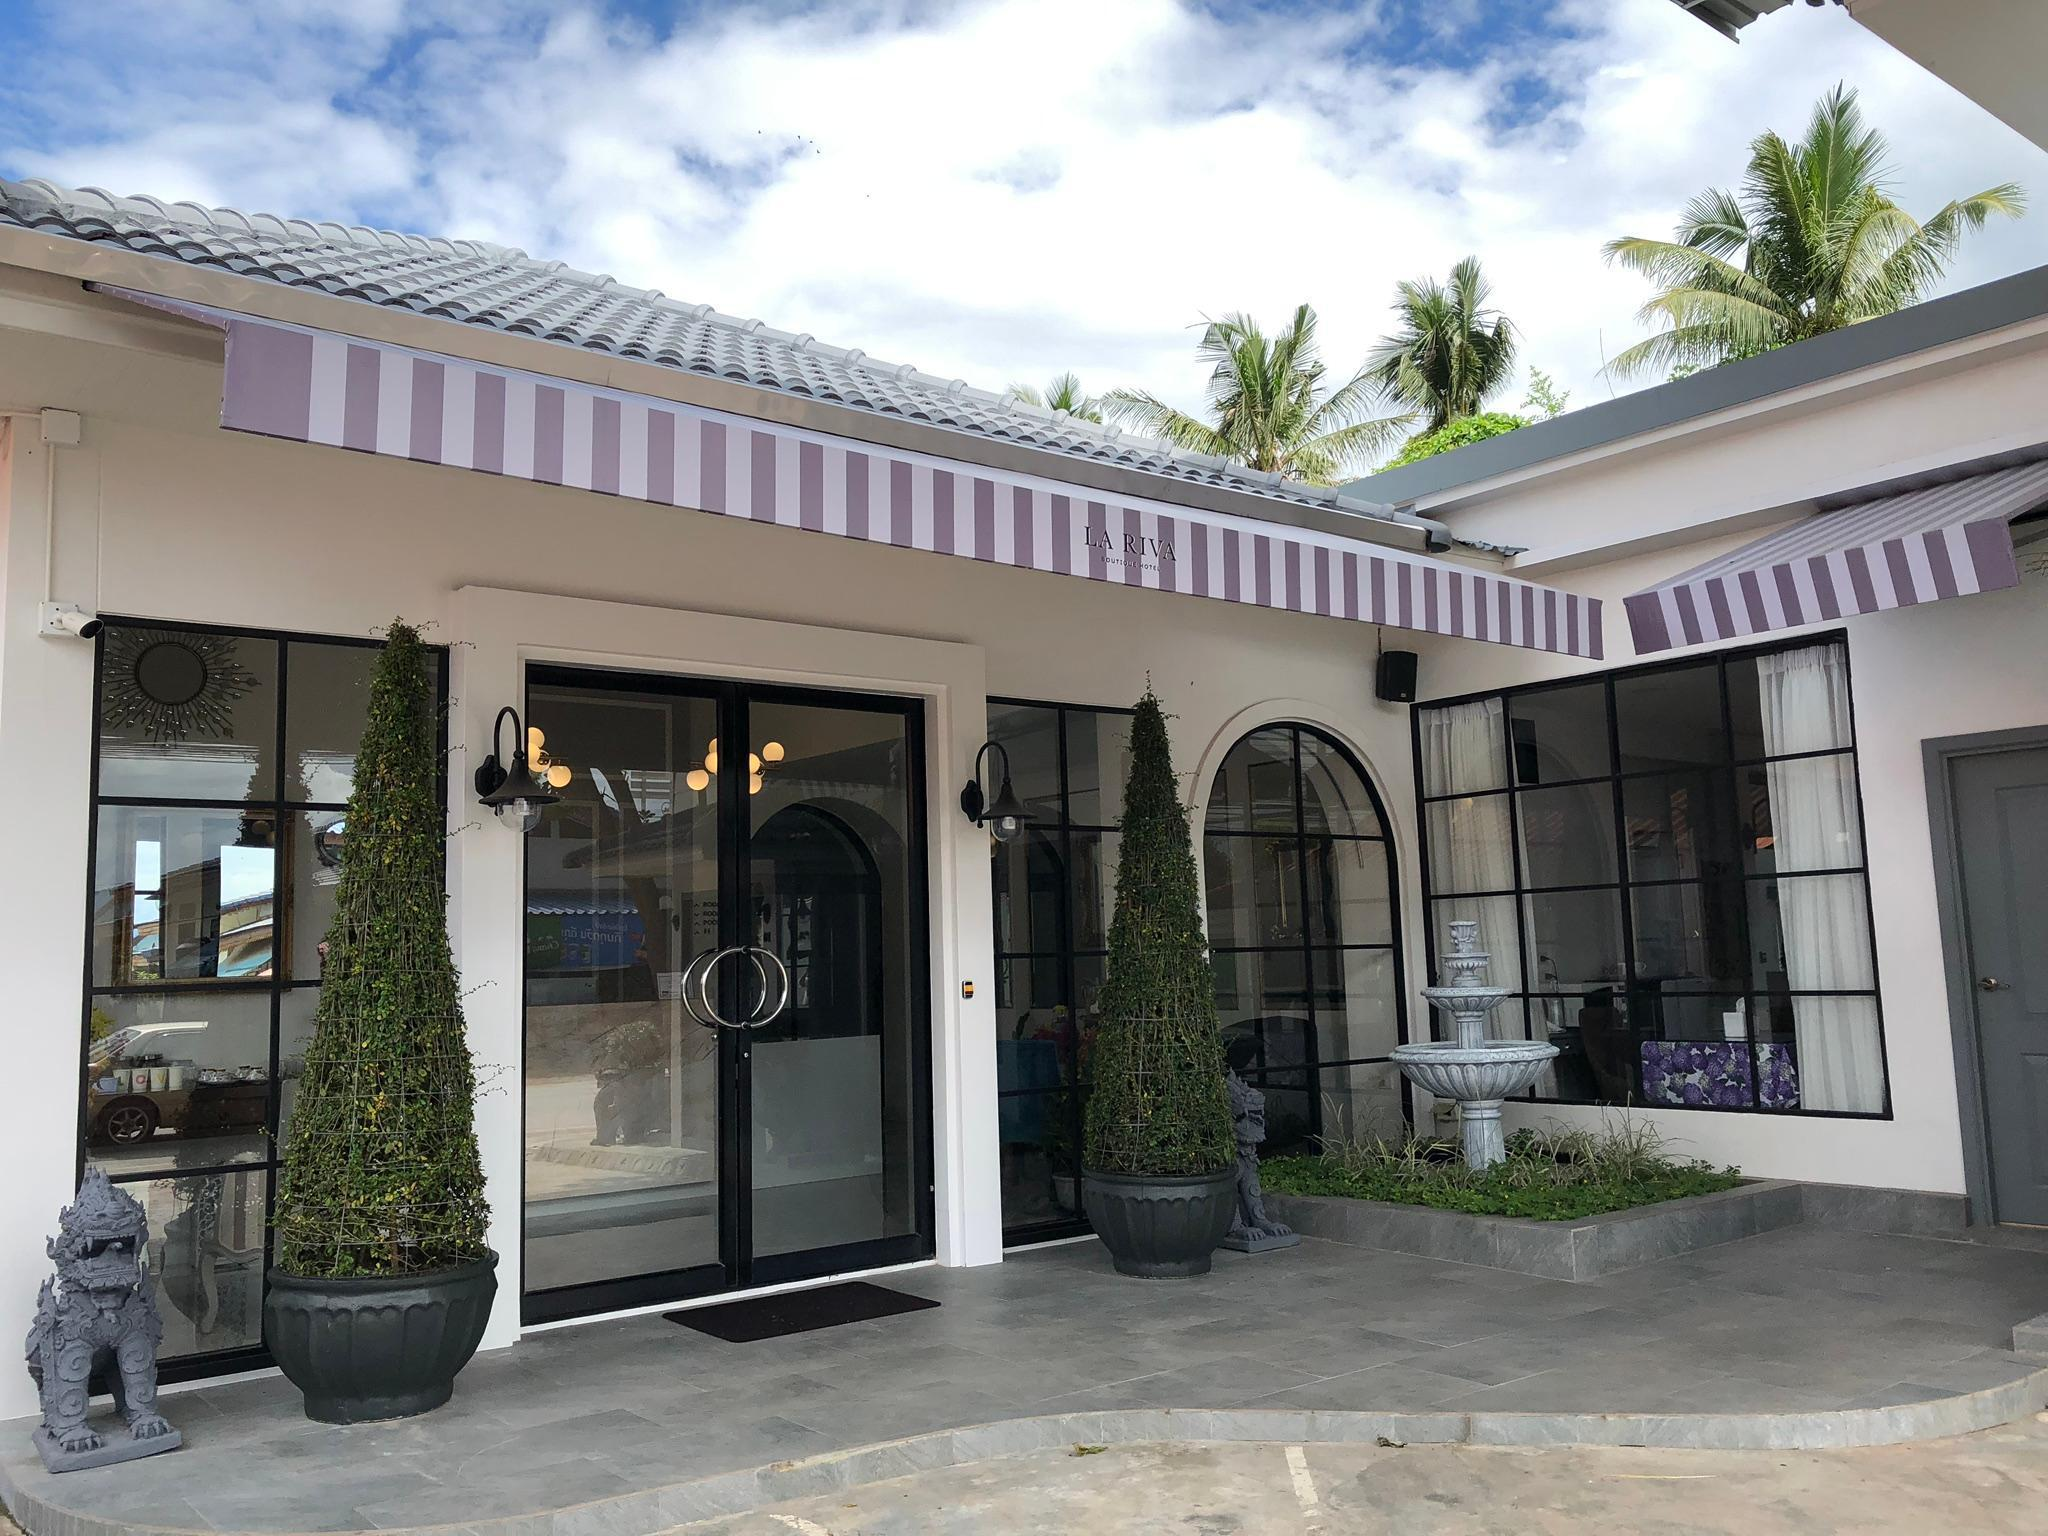 La Riva Boutique Hotel ลา ริวา บูทิก โฮเต็ล